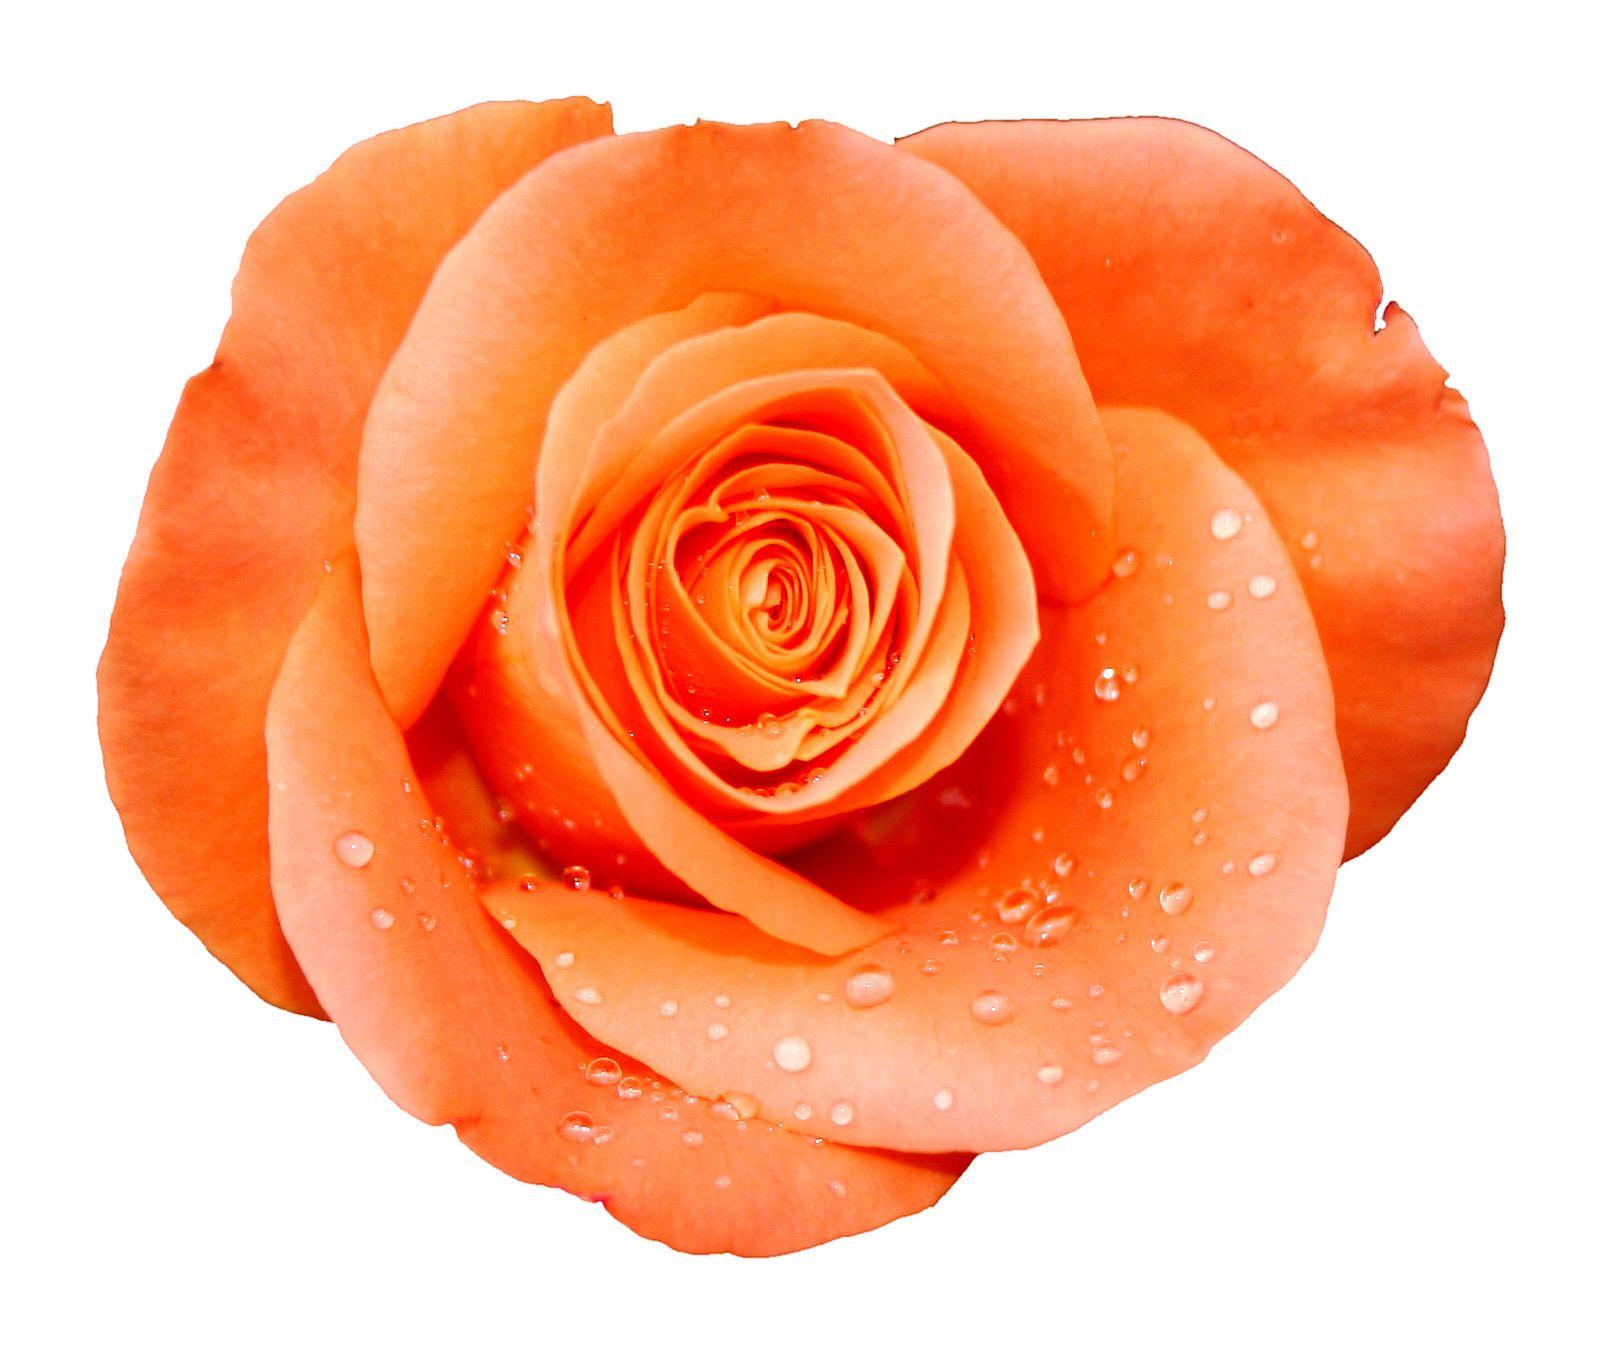 orange rose no background - Google Search | Flowers ...